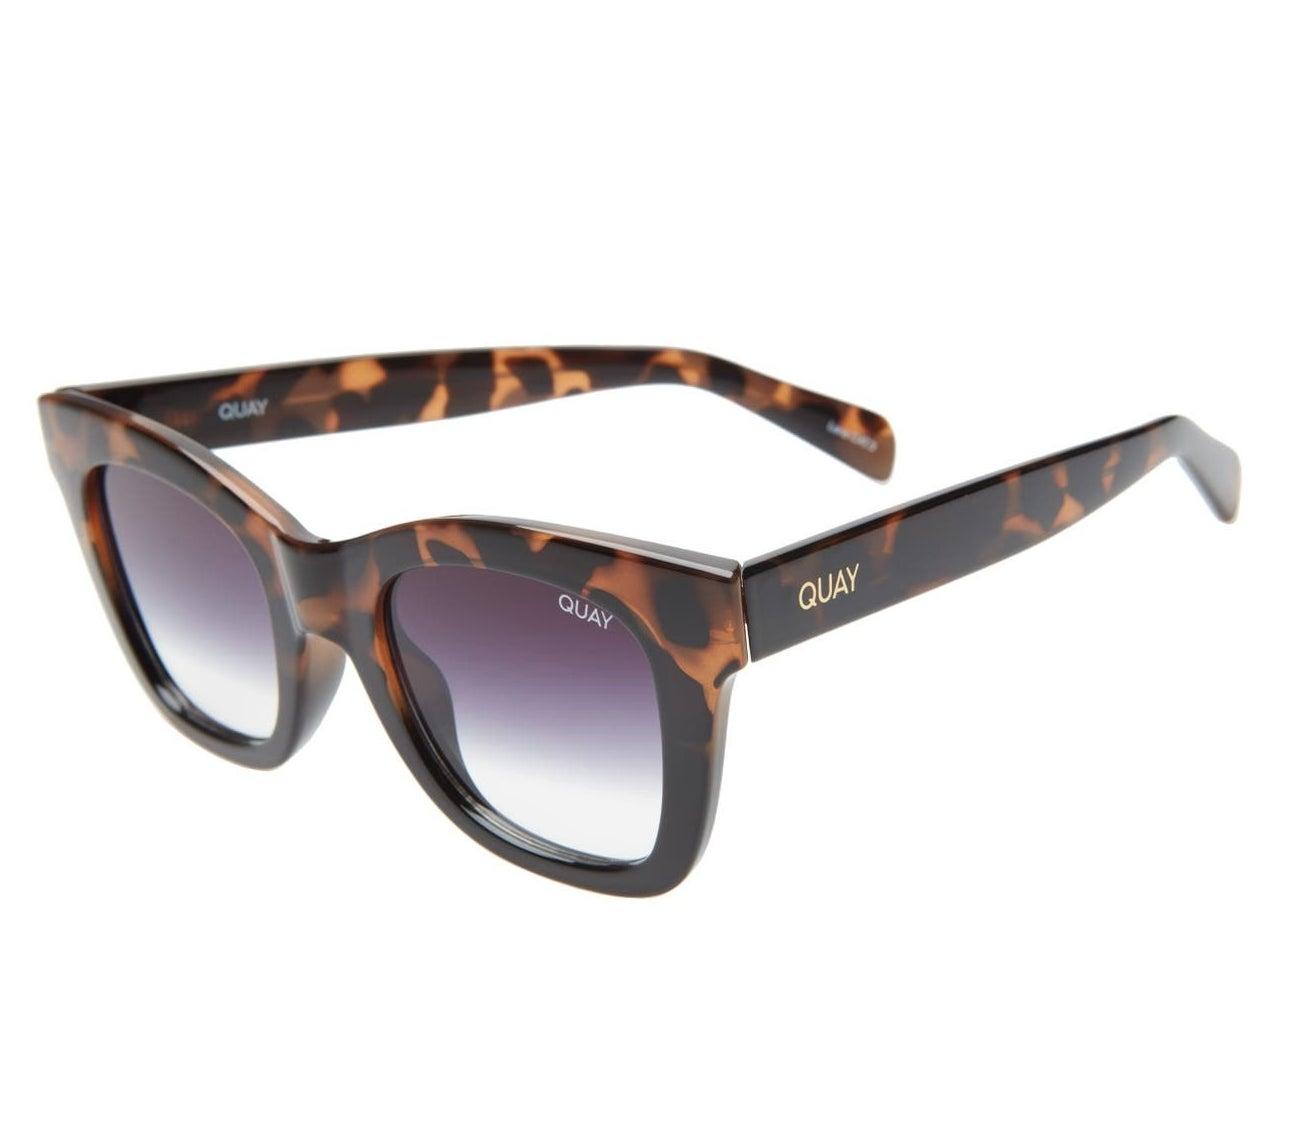 the tortoise sunglasses